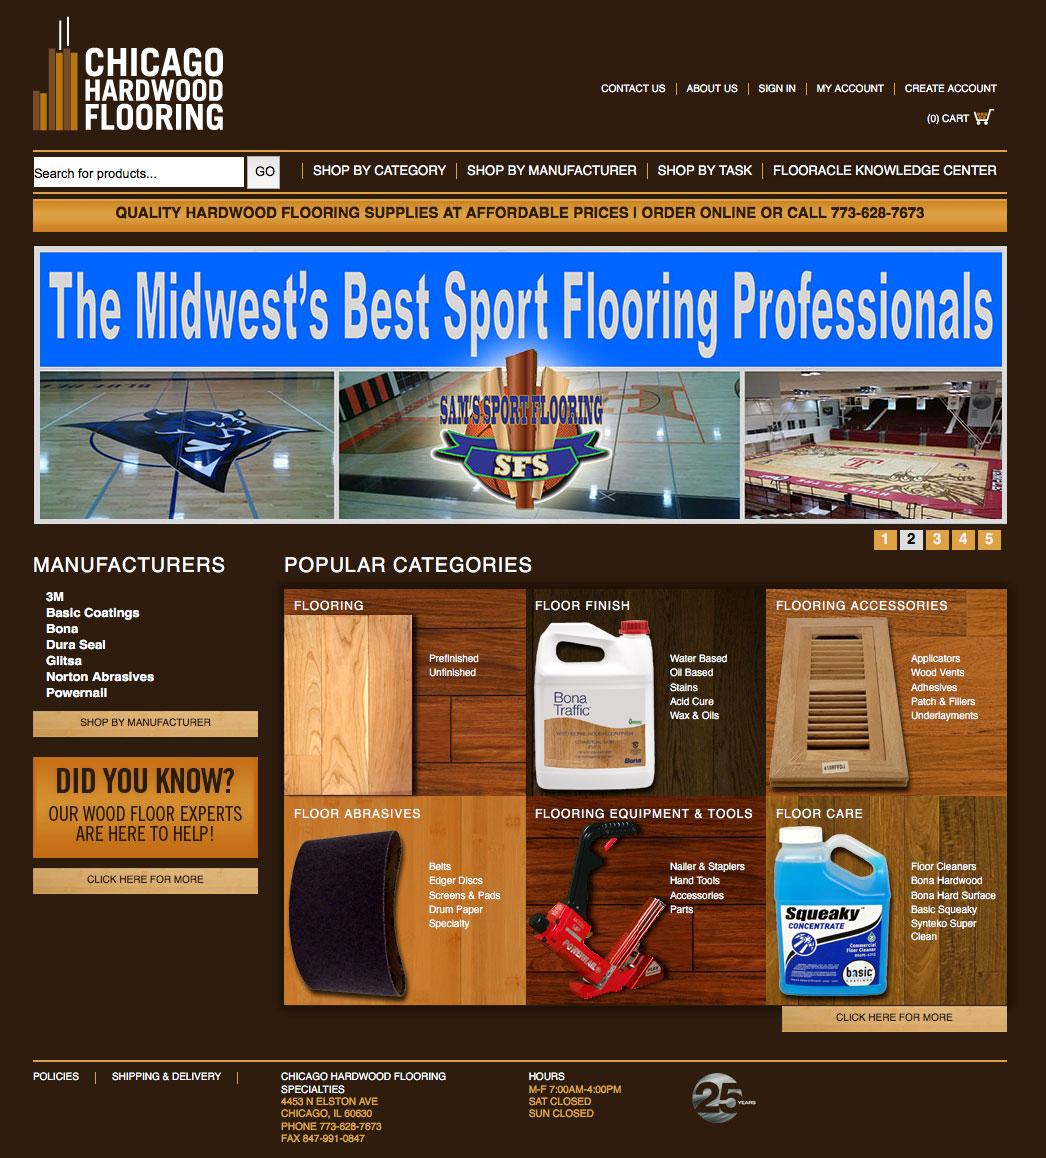 Attractive Chicago Hardwood Flooring Specialties Part - 10: Xeno Media